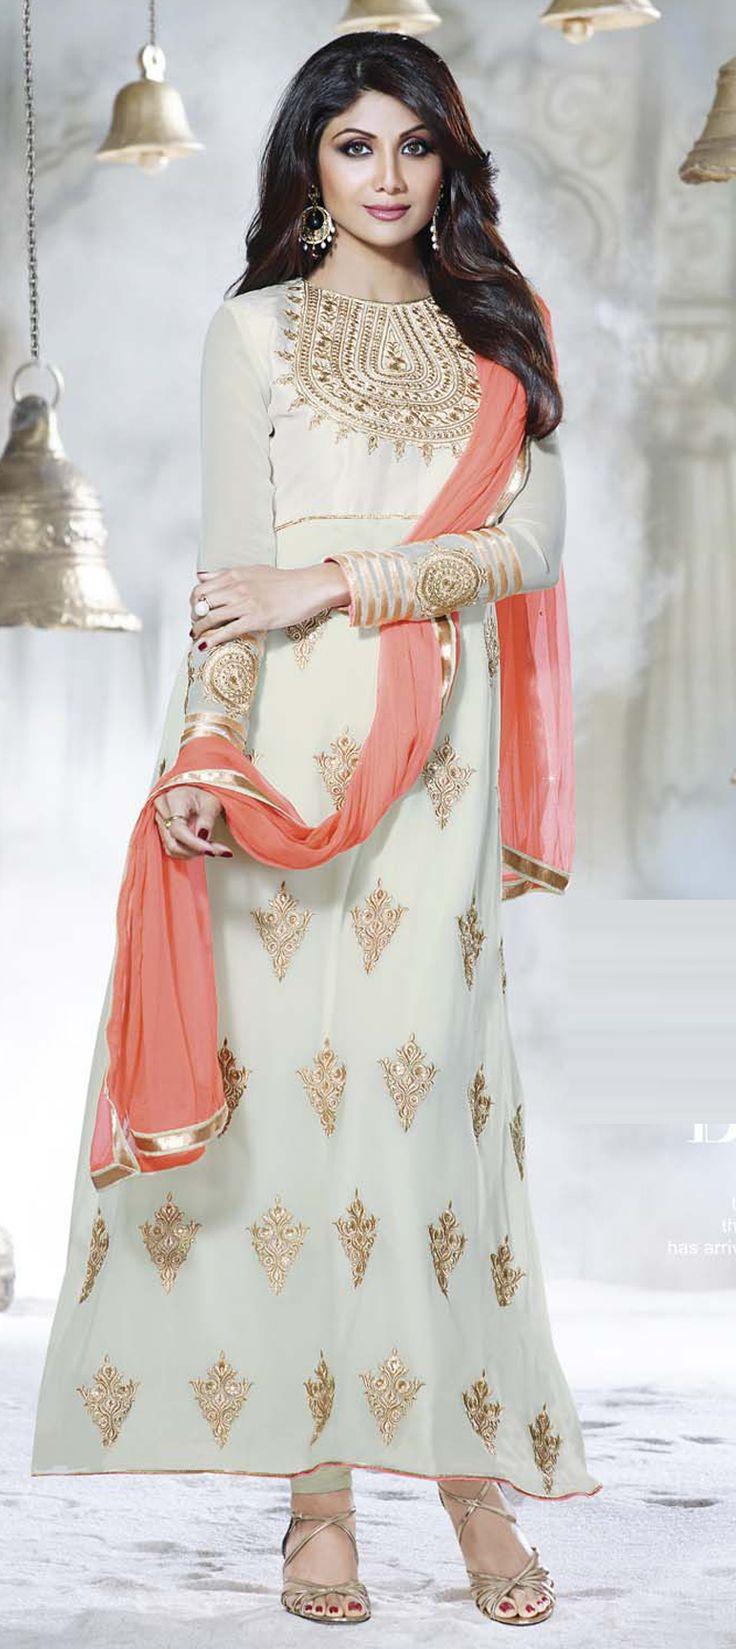 Steal #ShilpaShetty's style - Order now at flat 15% off + free shipping worldwide.  #SalwarKameez #BollywoodStyle #bollywood #celebritycloset #indianfashion #indianwedding #onlineshopping #Partywear